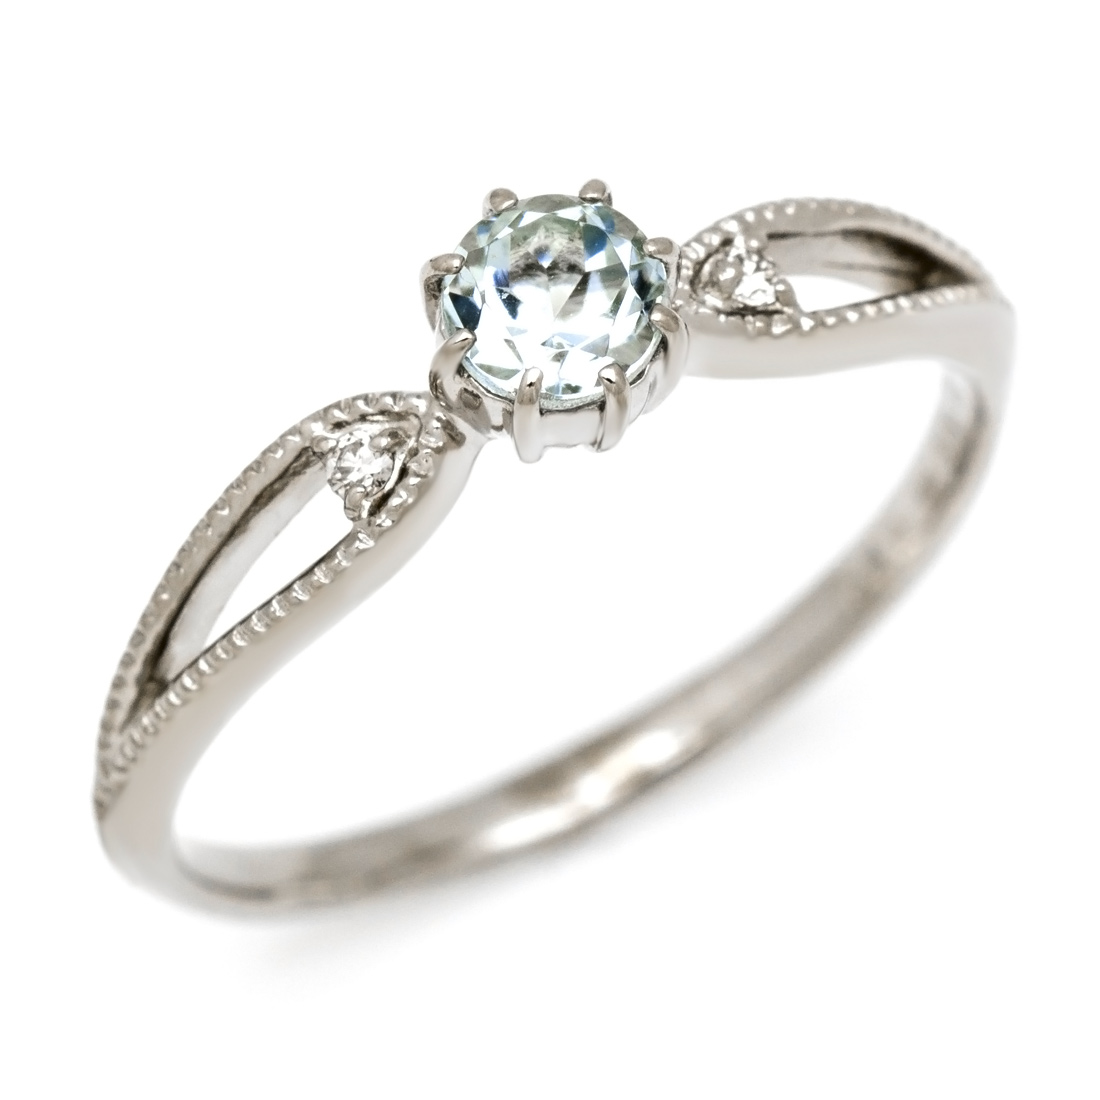 K10 アクアマリン ダイヤモンド リング 「rubacuori」 指輪 10K 10金 ゴールド アクワマリン ダイアモンド 3月誕生石 誕生日 文字入れ 刻印 ピンキーリング対応可能 メッセージ ギフト 贈り物